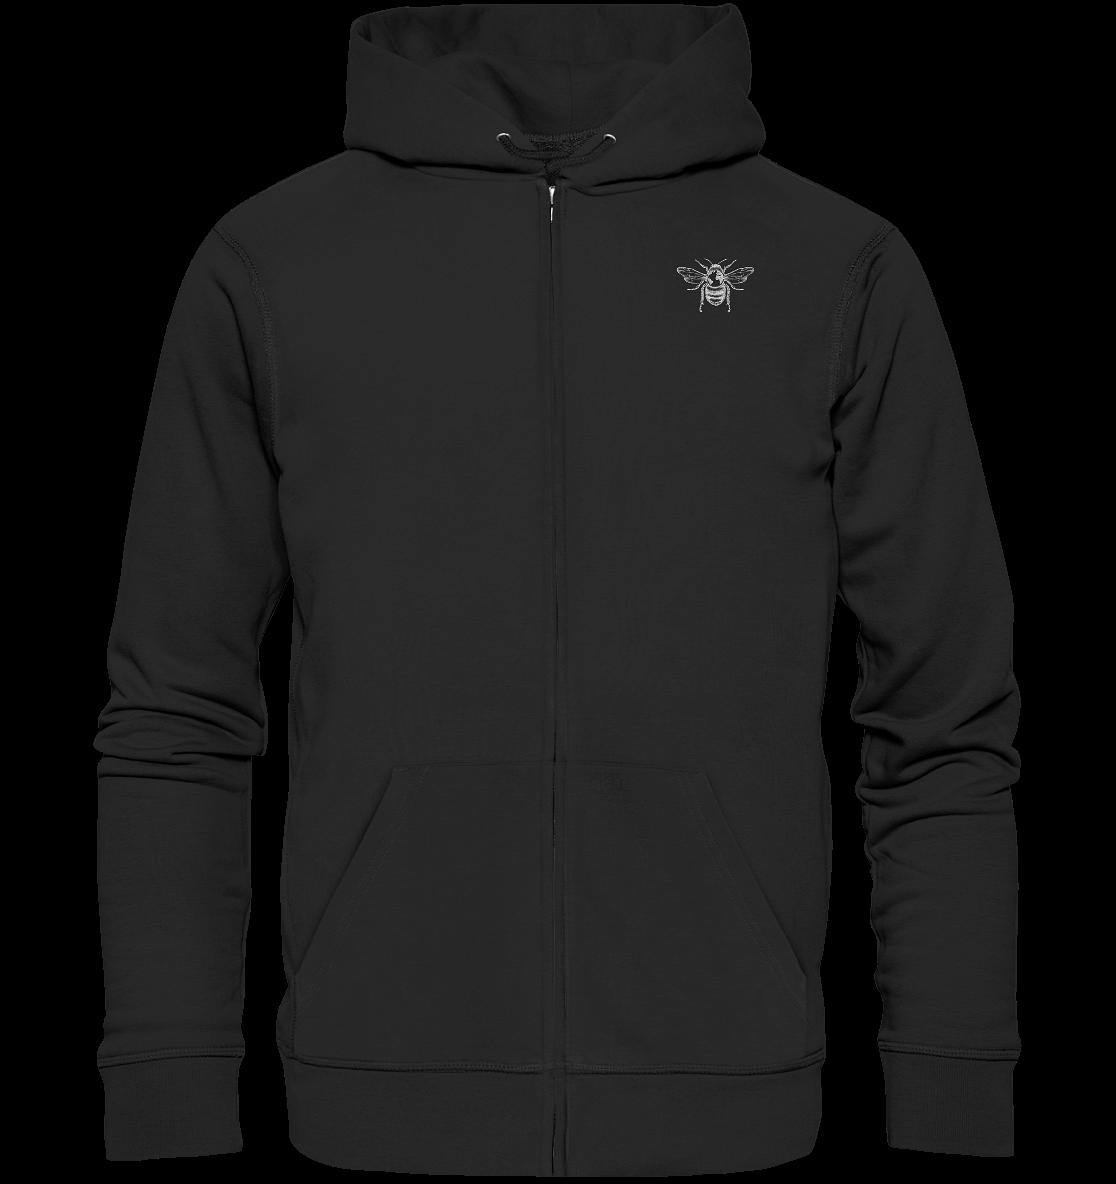 front-organic-zipper-272727-1116x.png